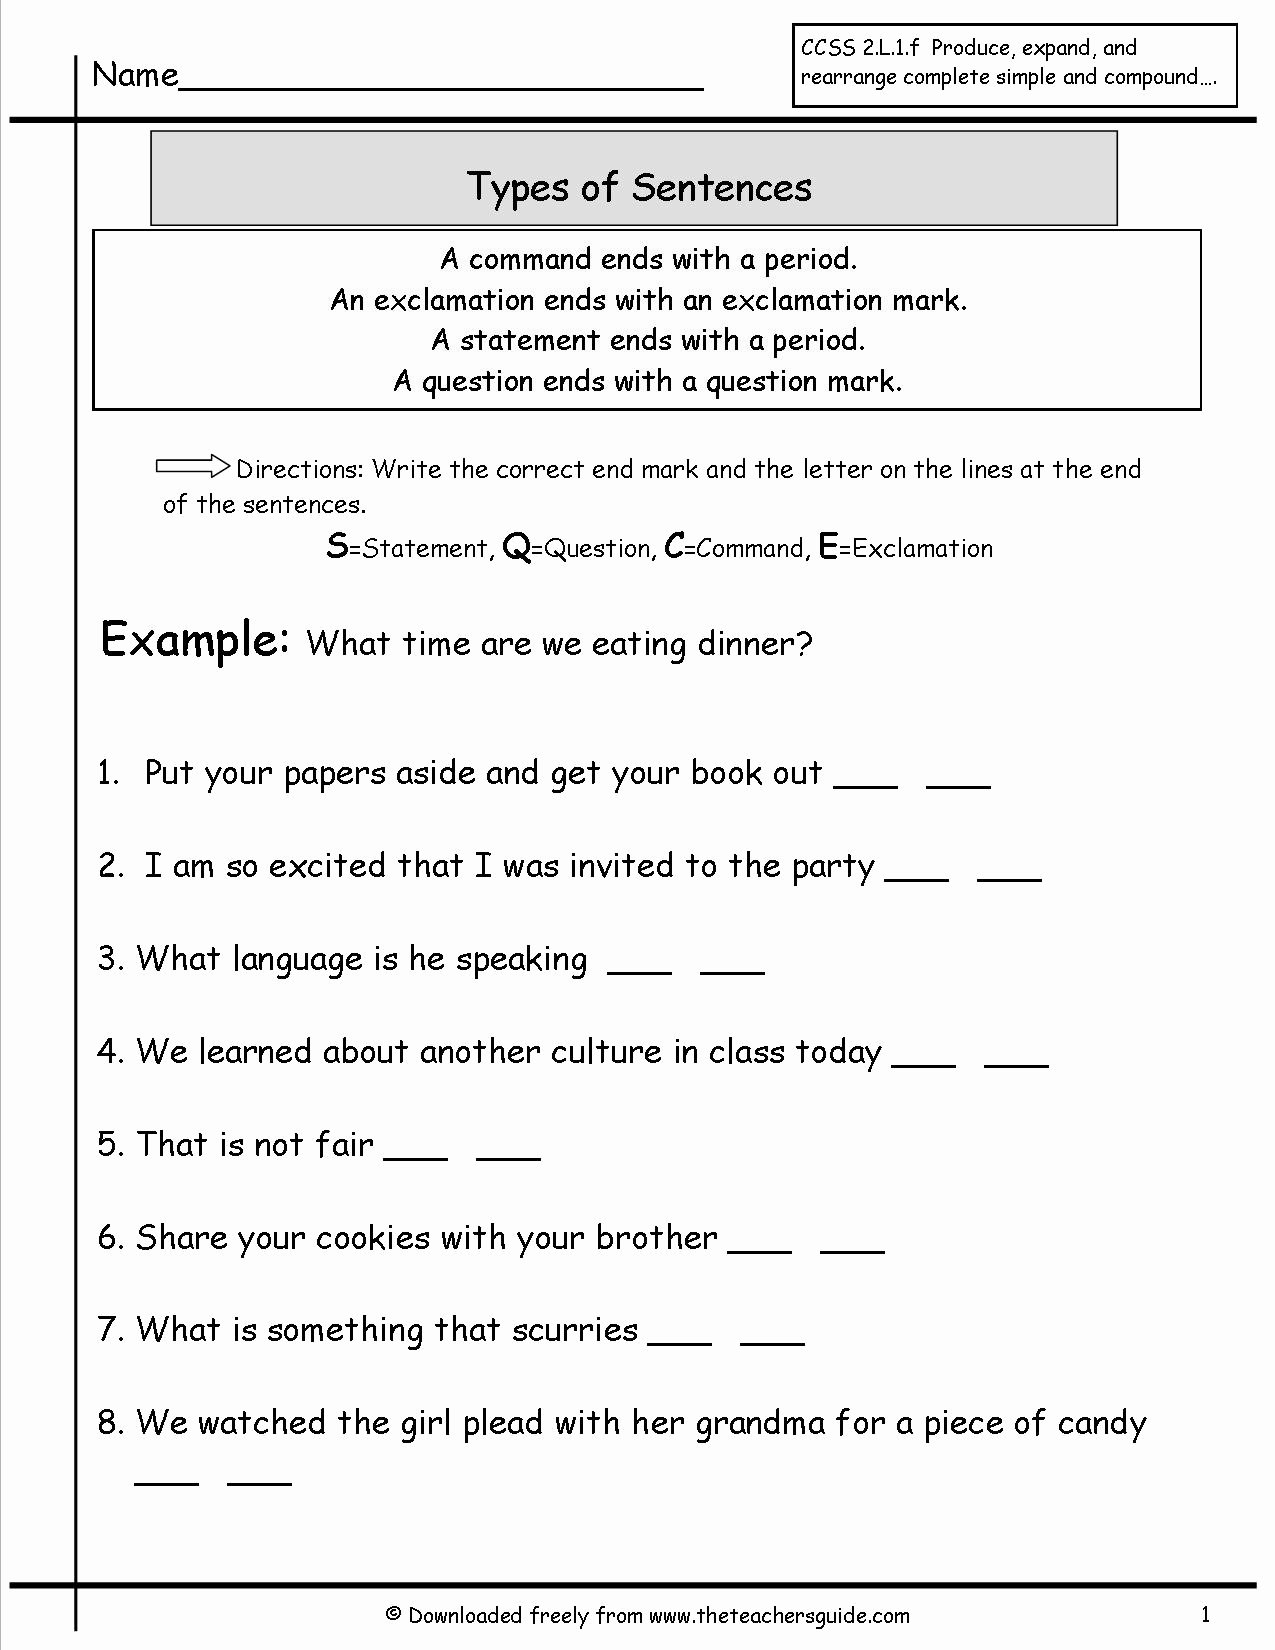 50 Four Types Of Sentences Worksheet